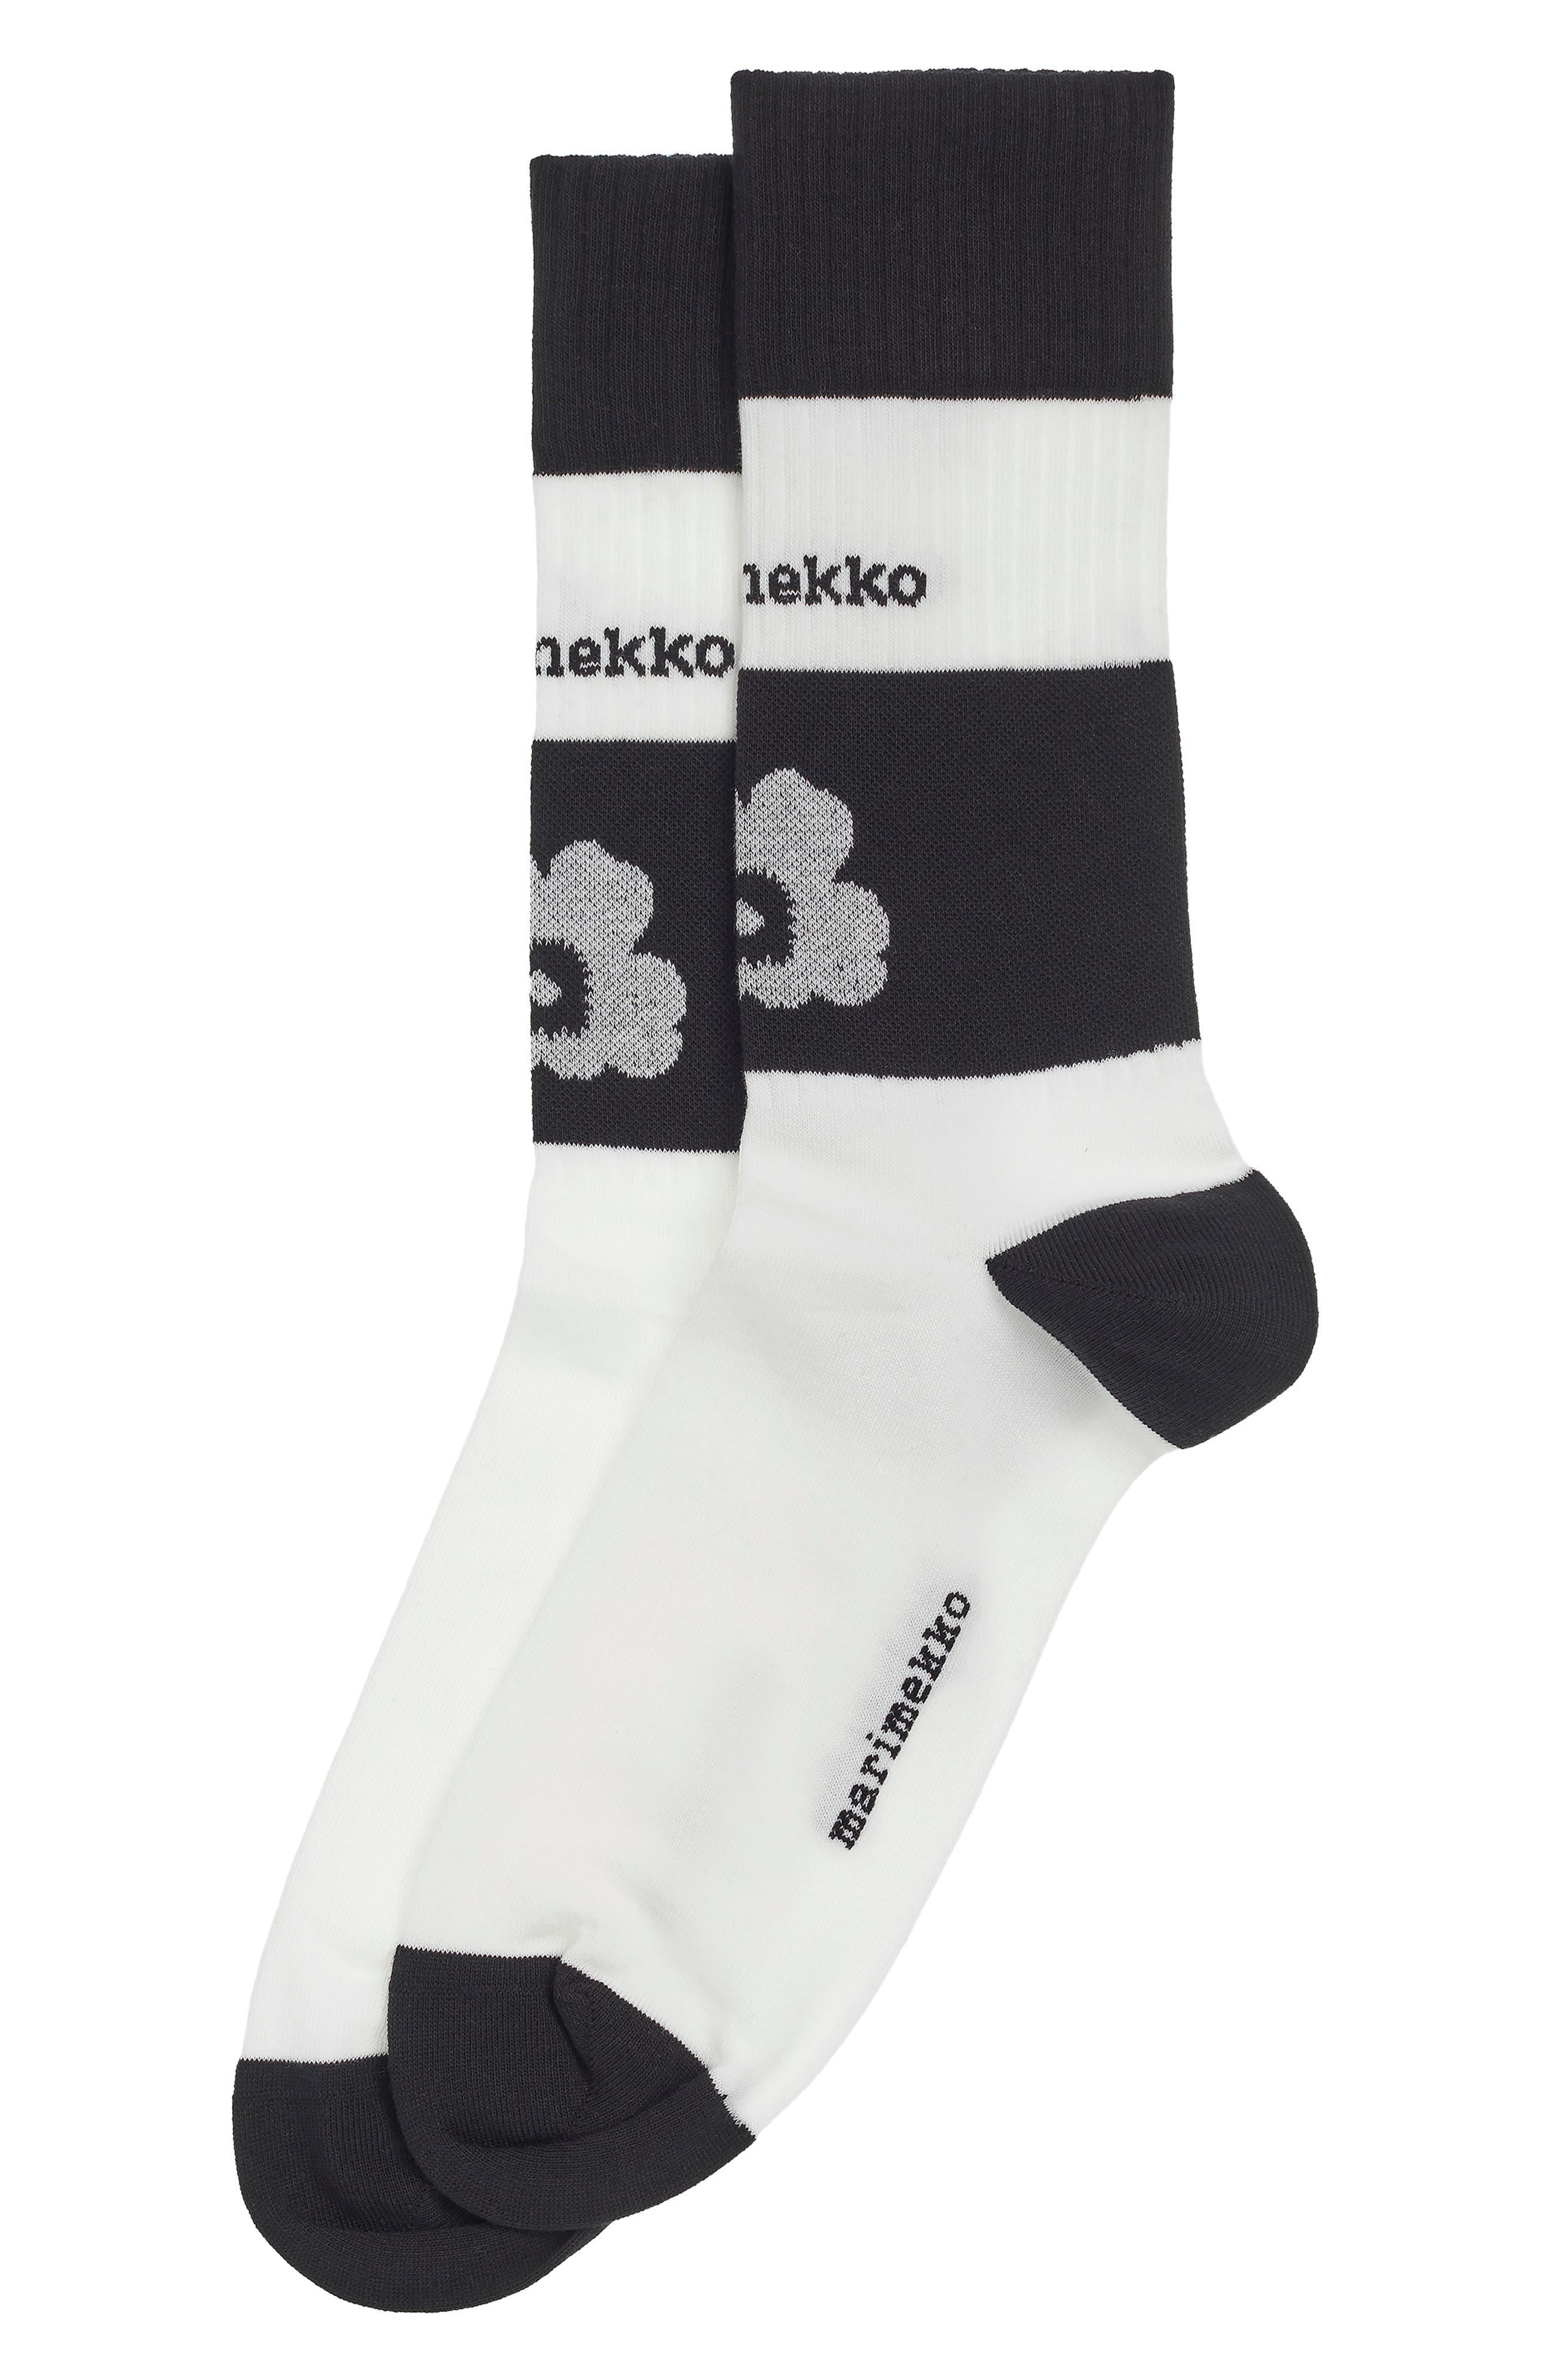 Unisex Kioski Kohina Unikko Floral Logo Socks